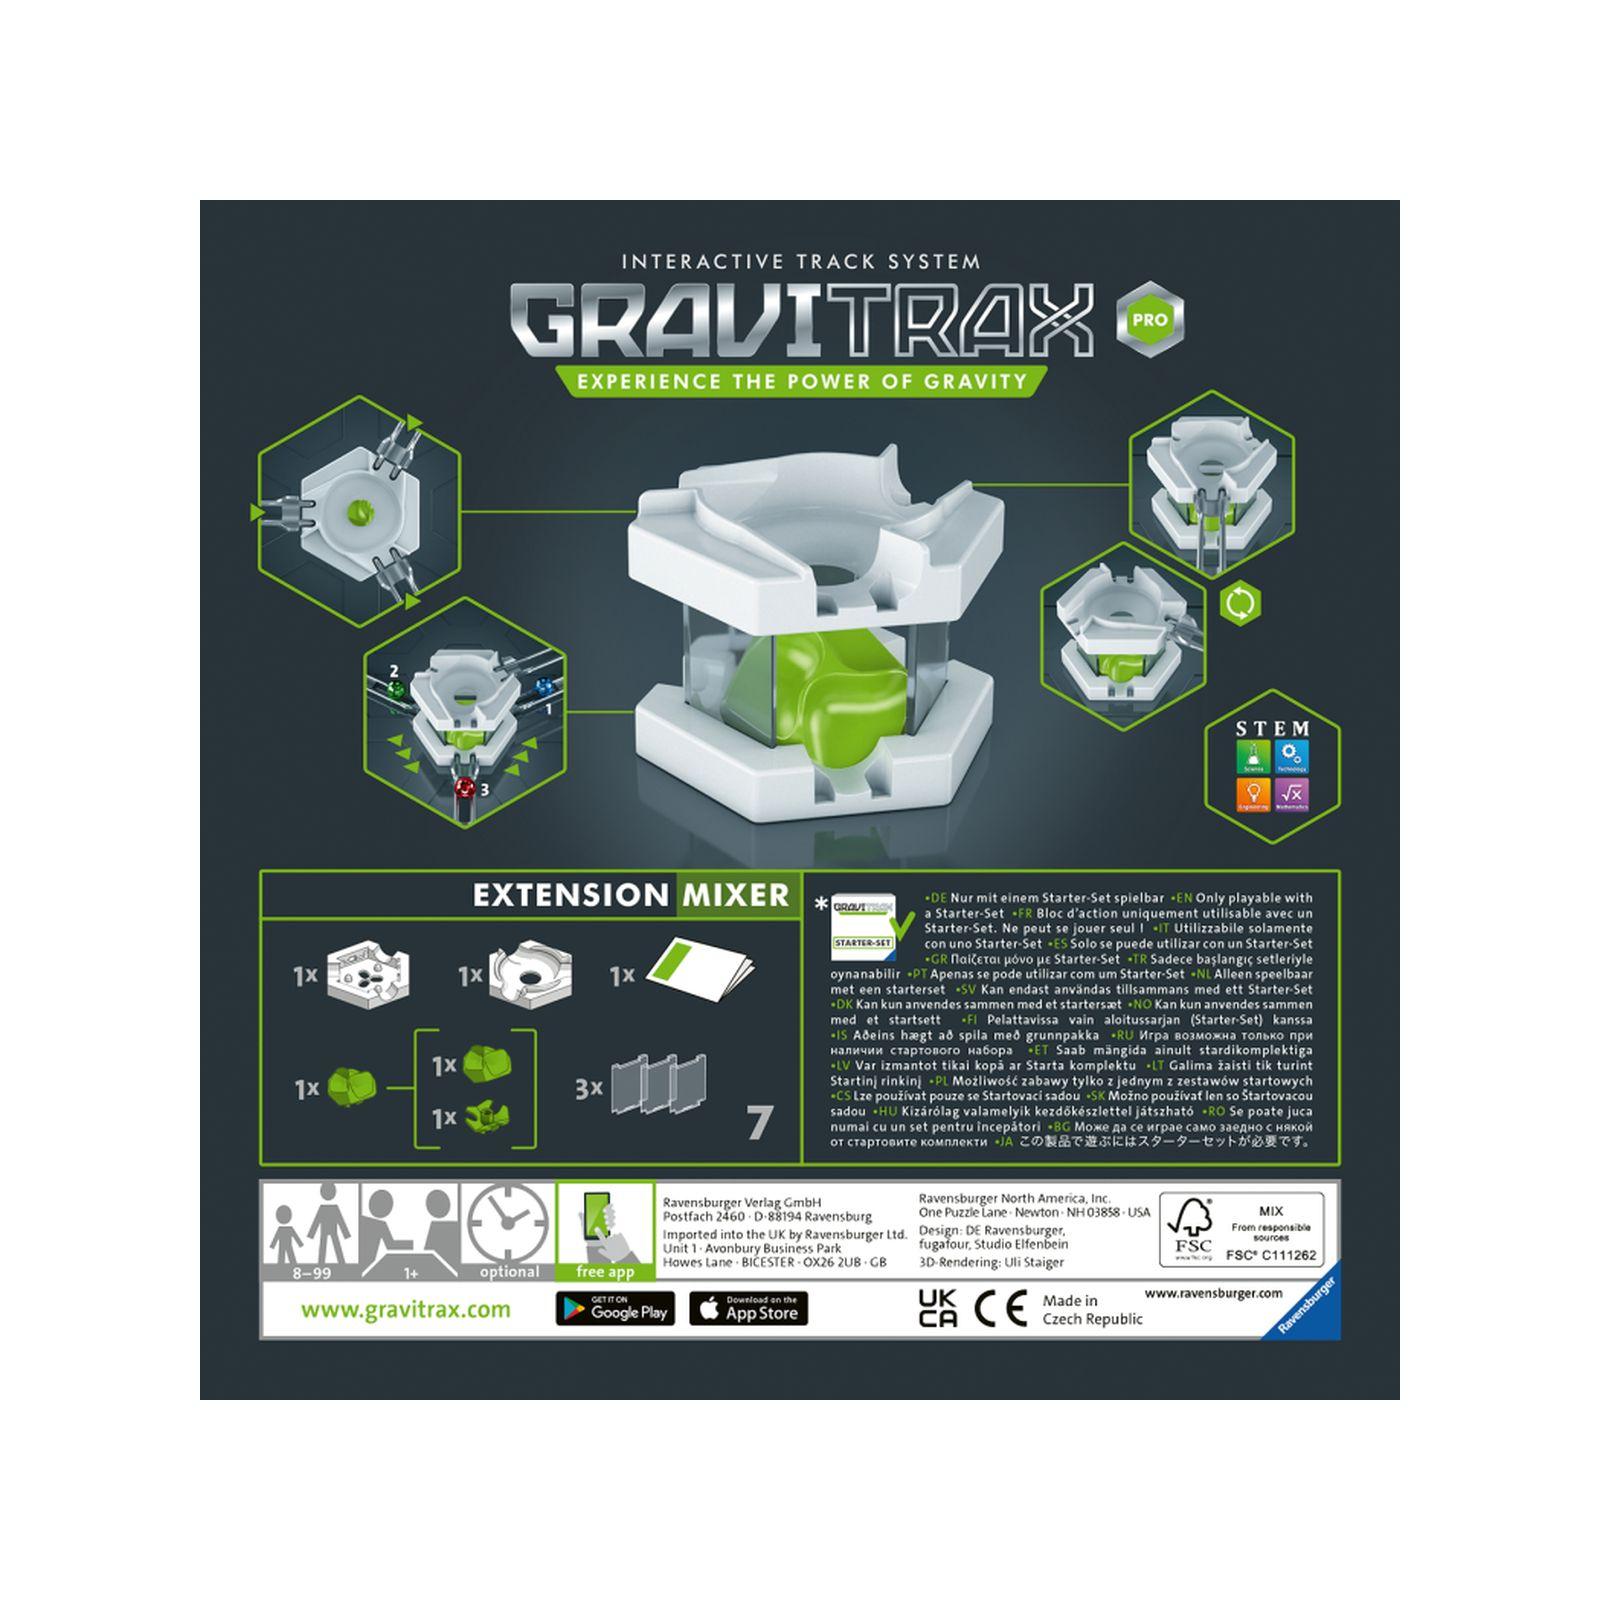 Ravensburger gravitrax pro mixer - Gravitrax1